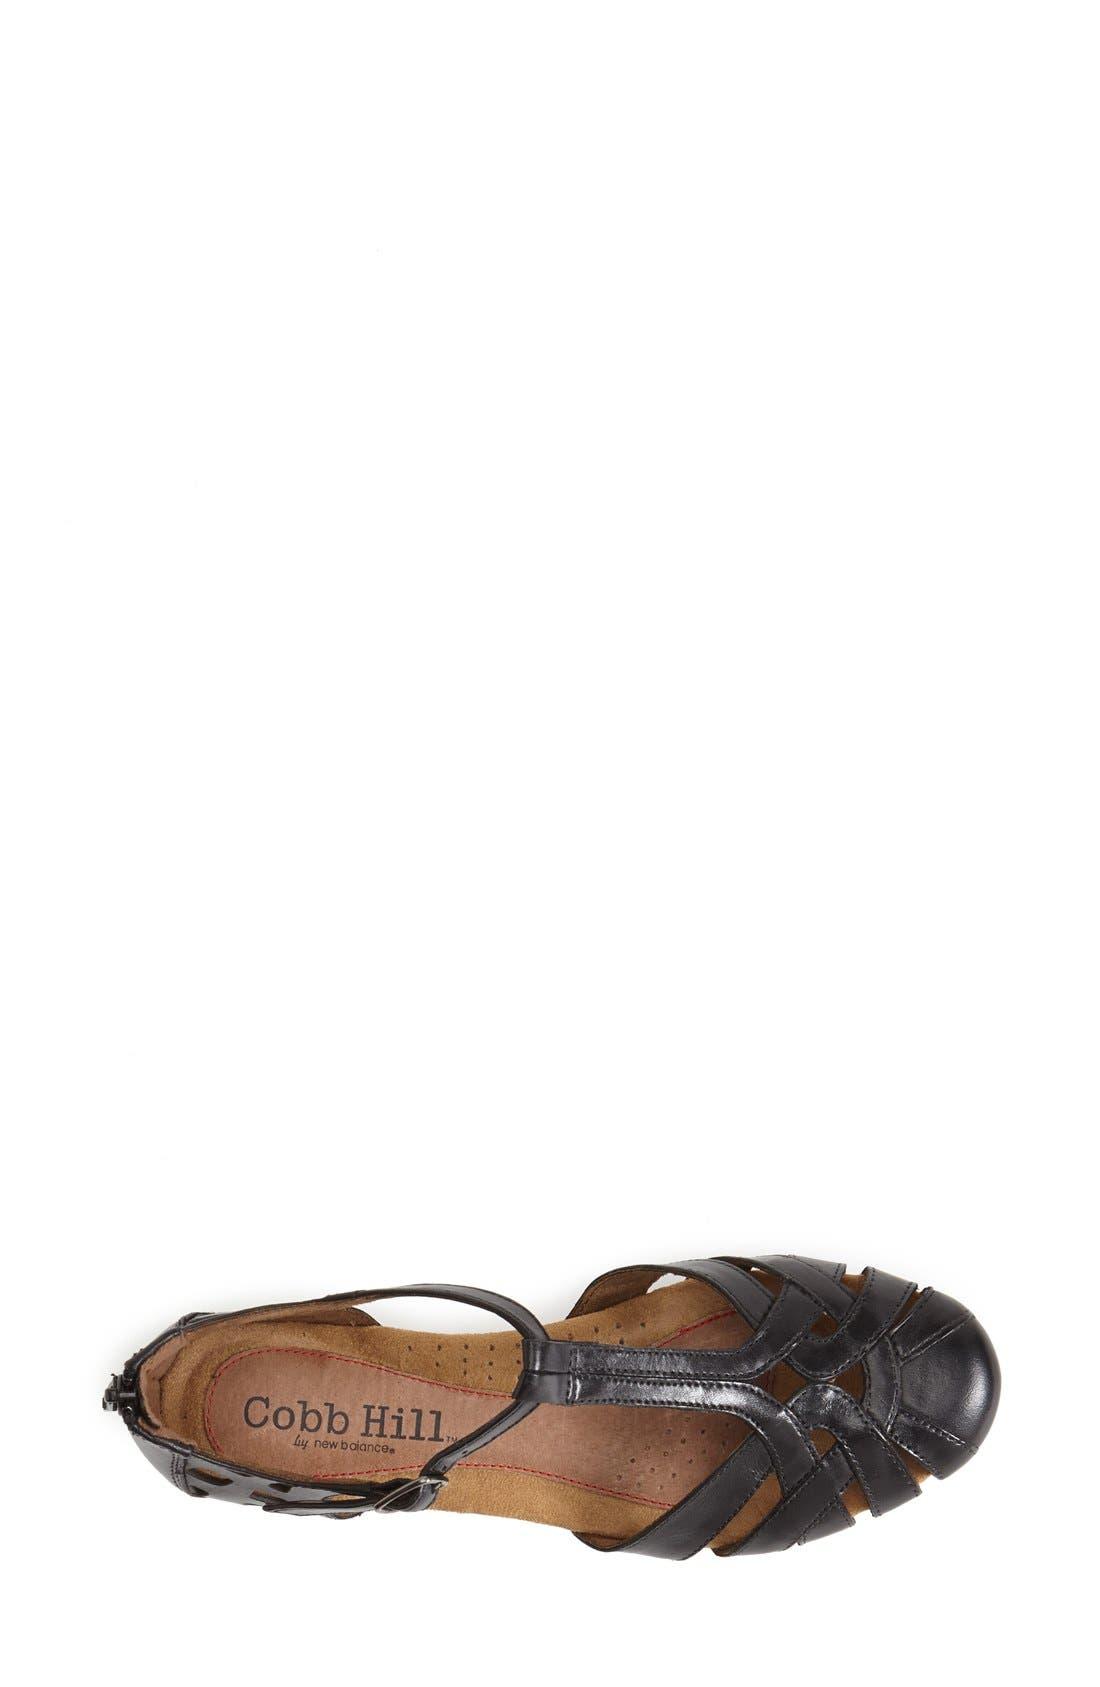 Alternate Image 3  - Rockport Cobb Hill 'Ireland' Leather Sandal (Women)